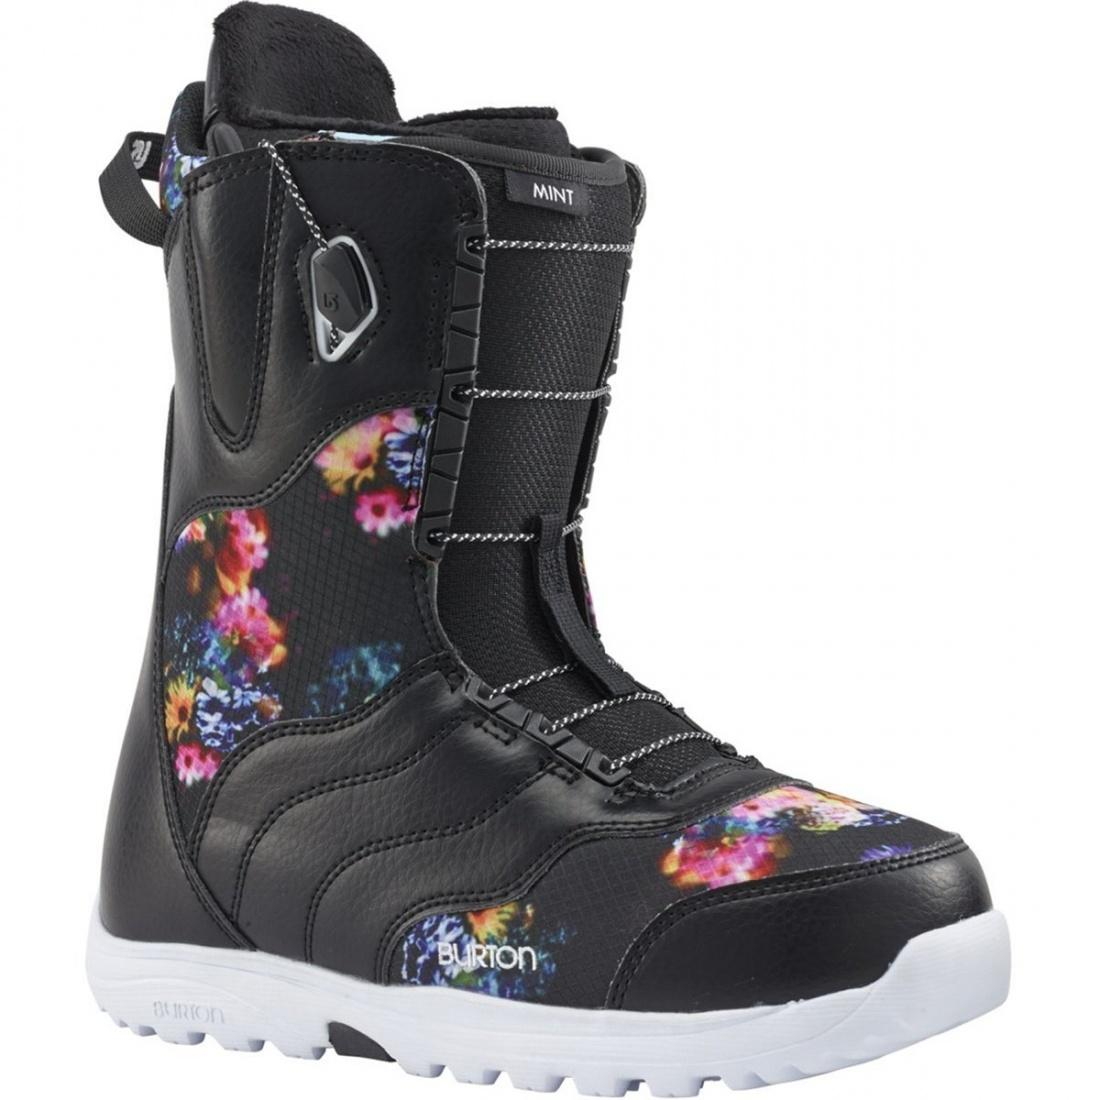 Ботинки для сноуборда Burton Mint купить в Boardshop №1